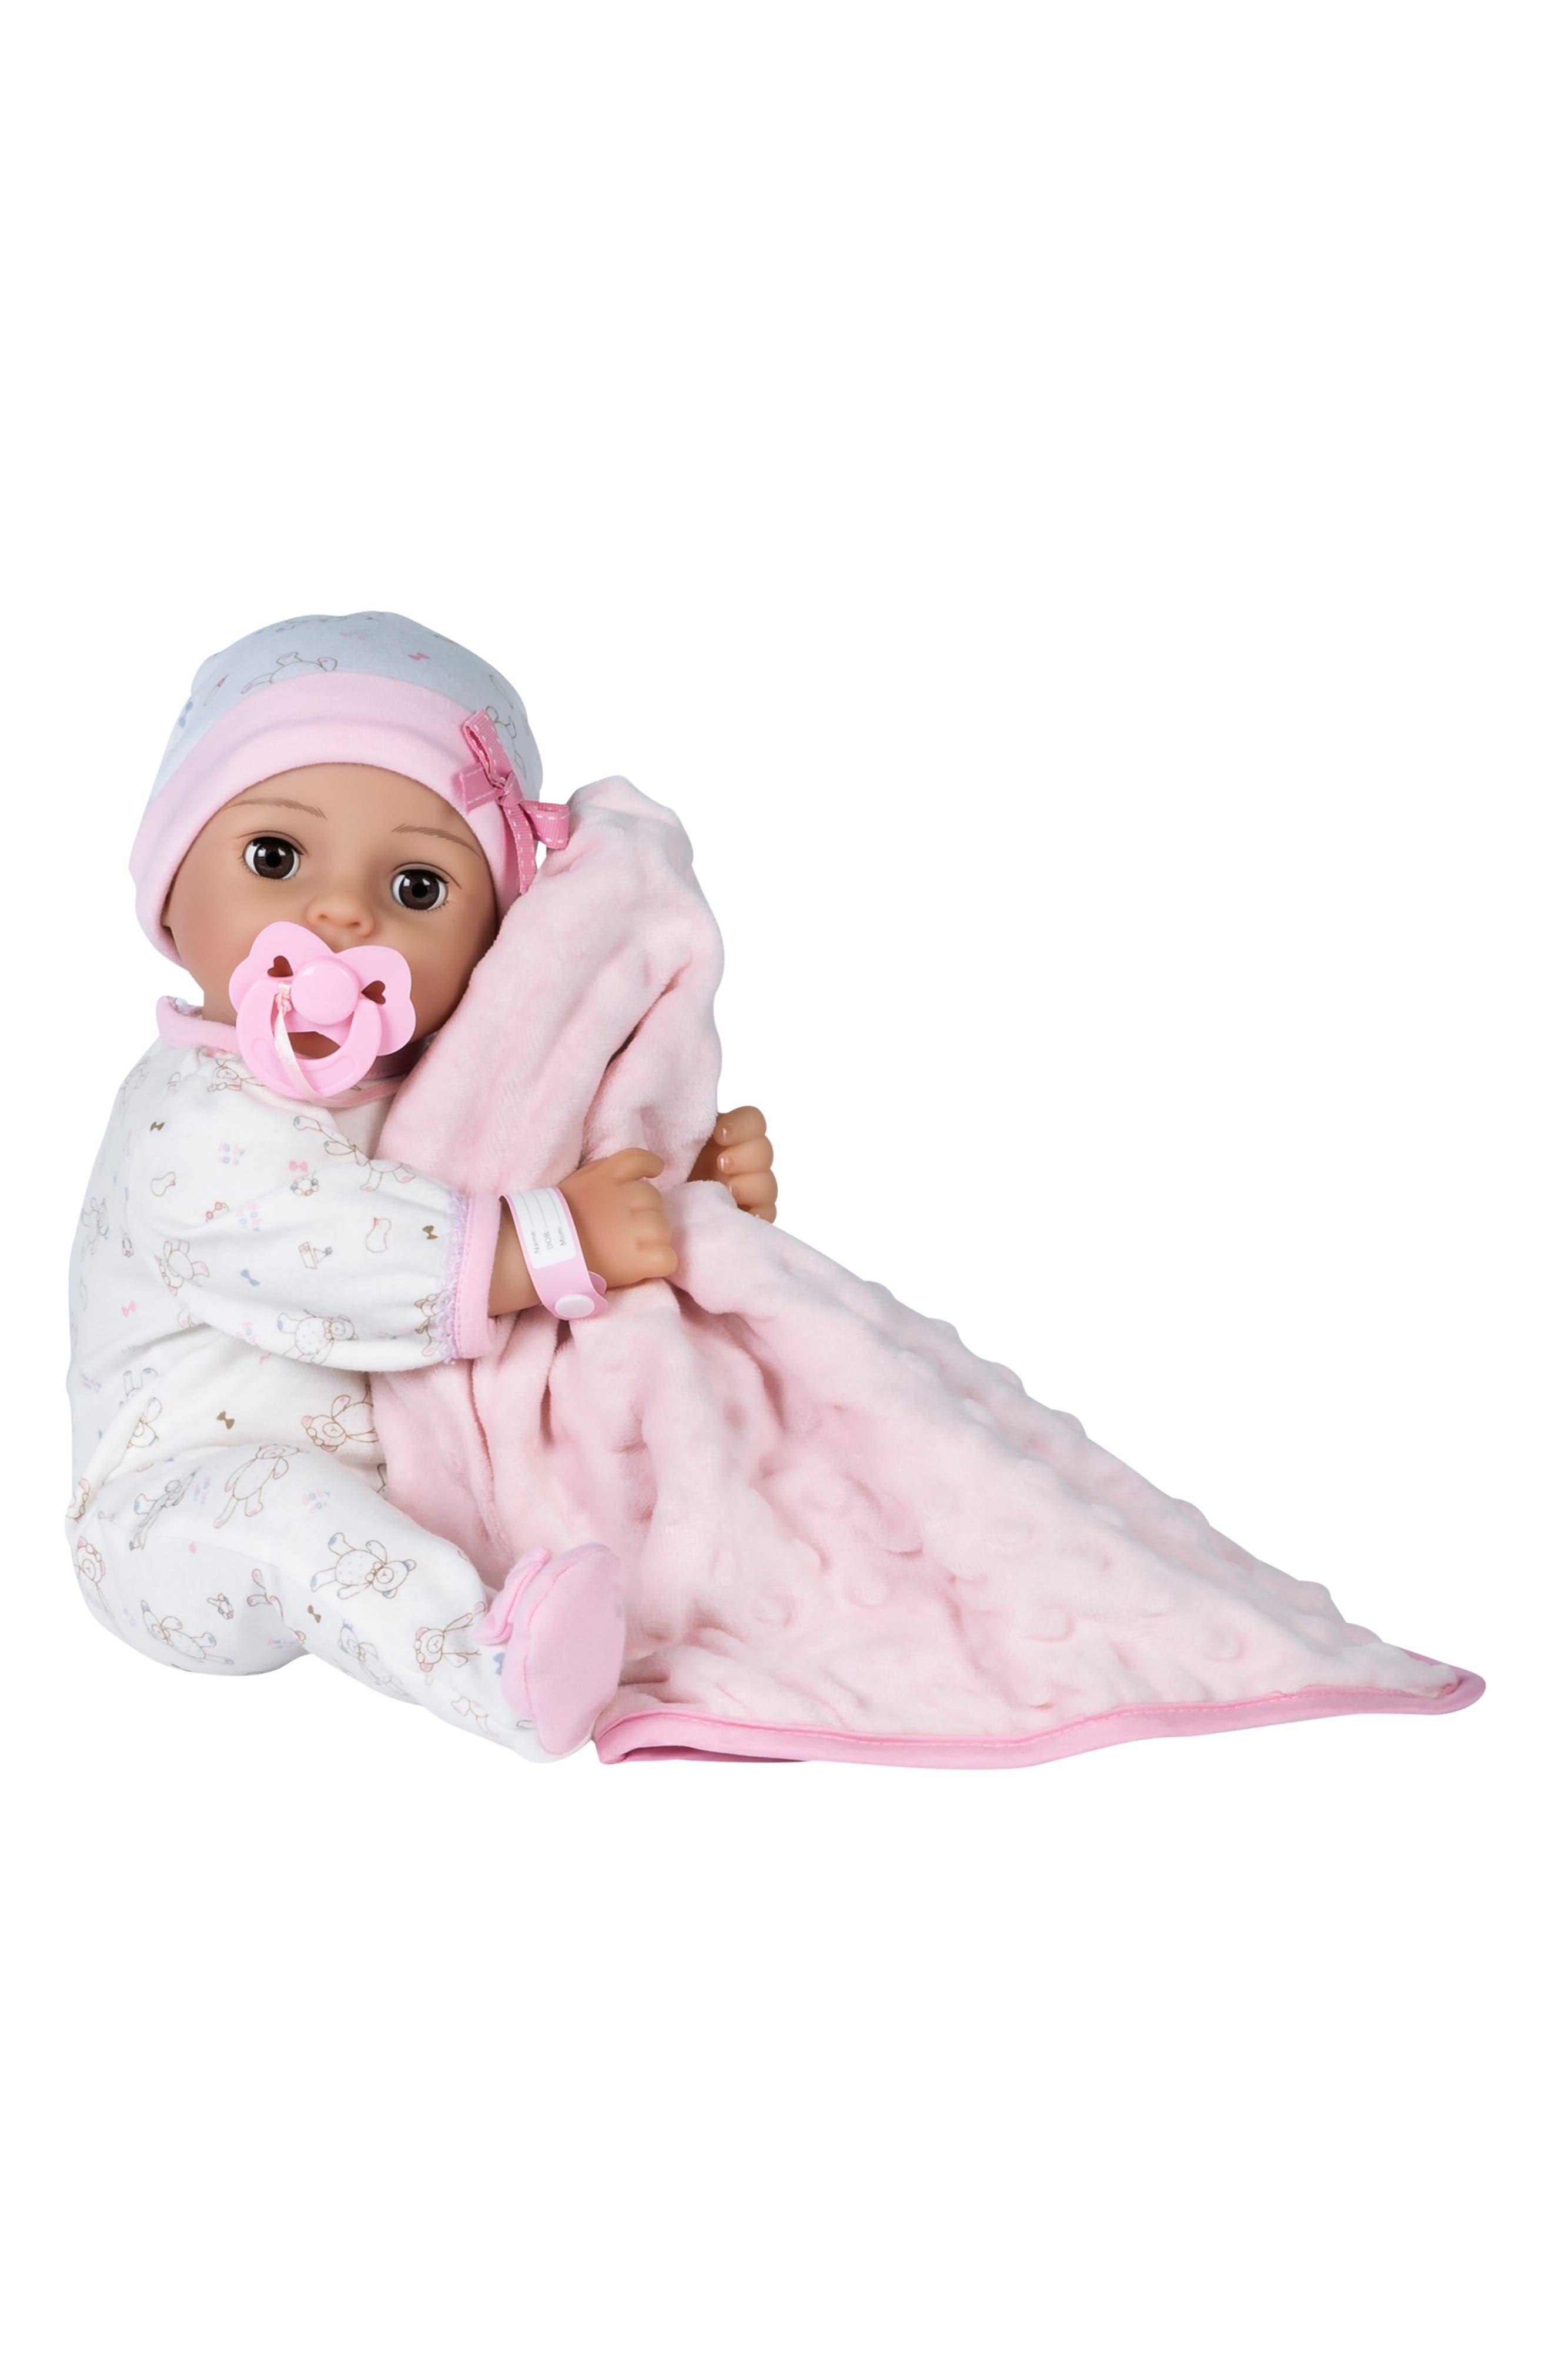 Girls Adora Cherish Baby Doll With Adoption Certificate